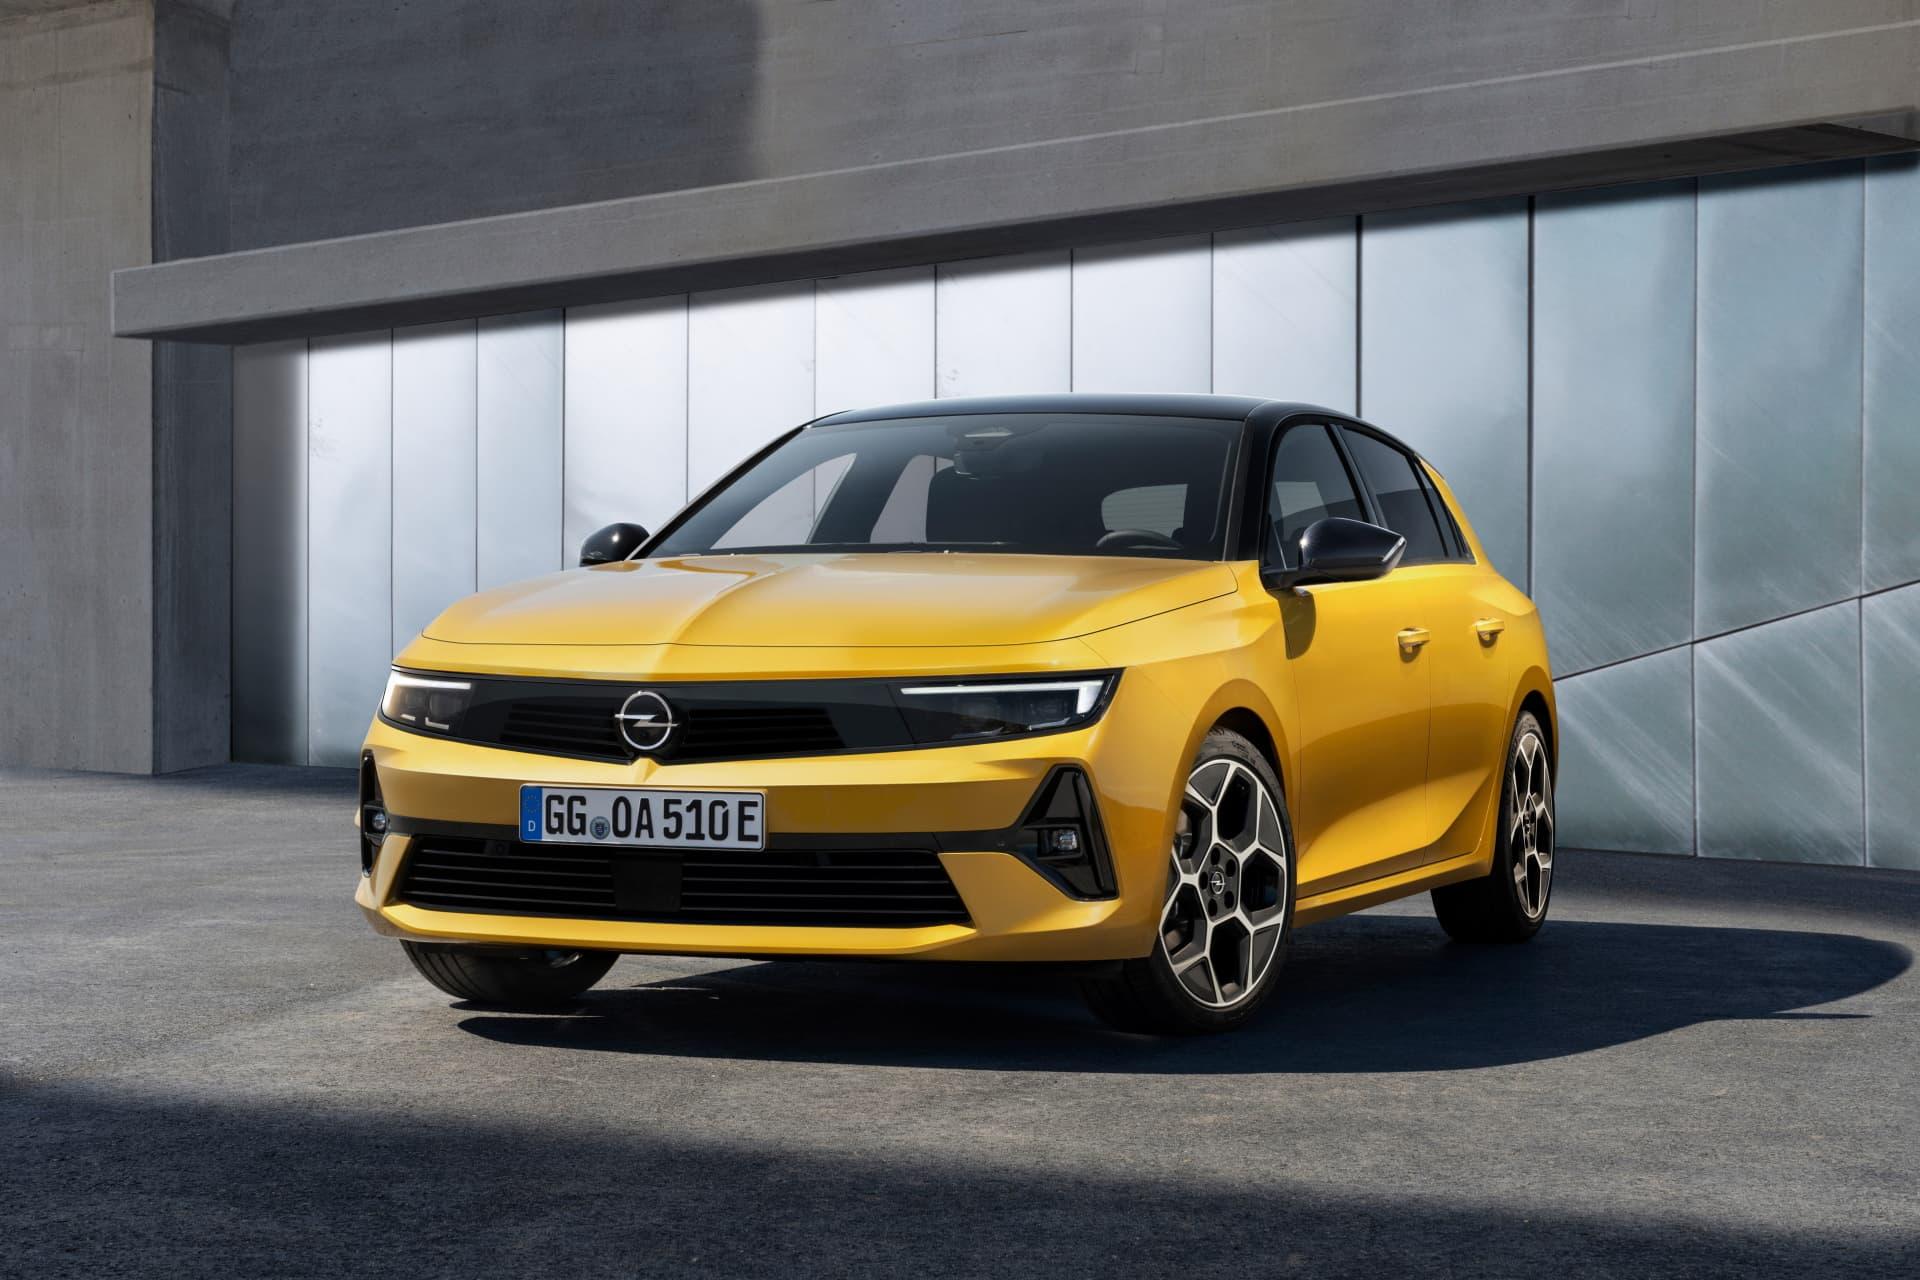 Opel Astra 2022 Frontal Amarillo 01